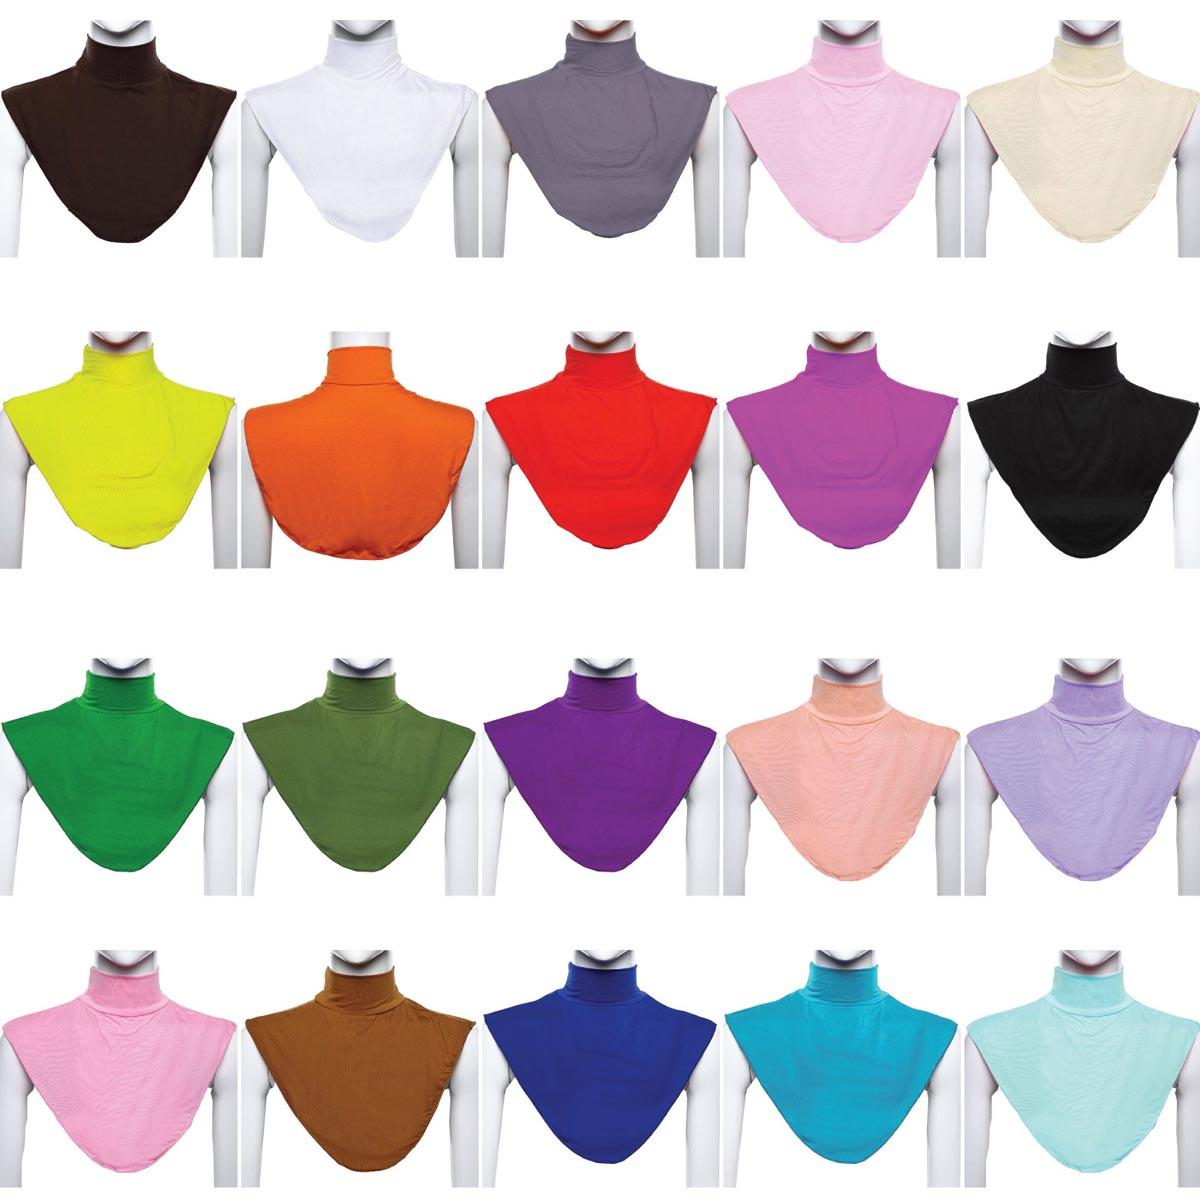 Ramdan Women Muslim Hijab Islamic Turtleneck Neck Cover False Collar Wrap Apparel Moslem Loop Scarf Fake T-shirt Collar  20 Colo